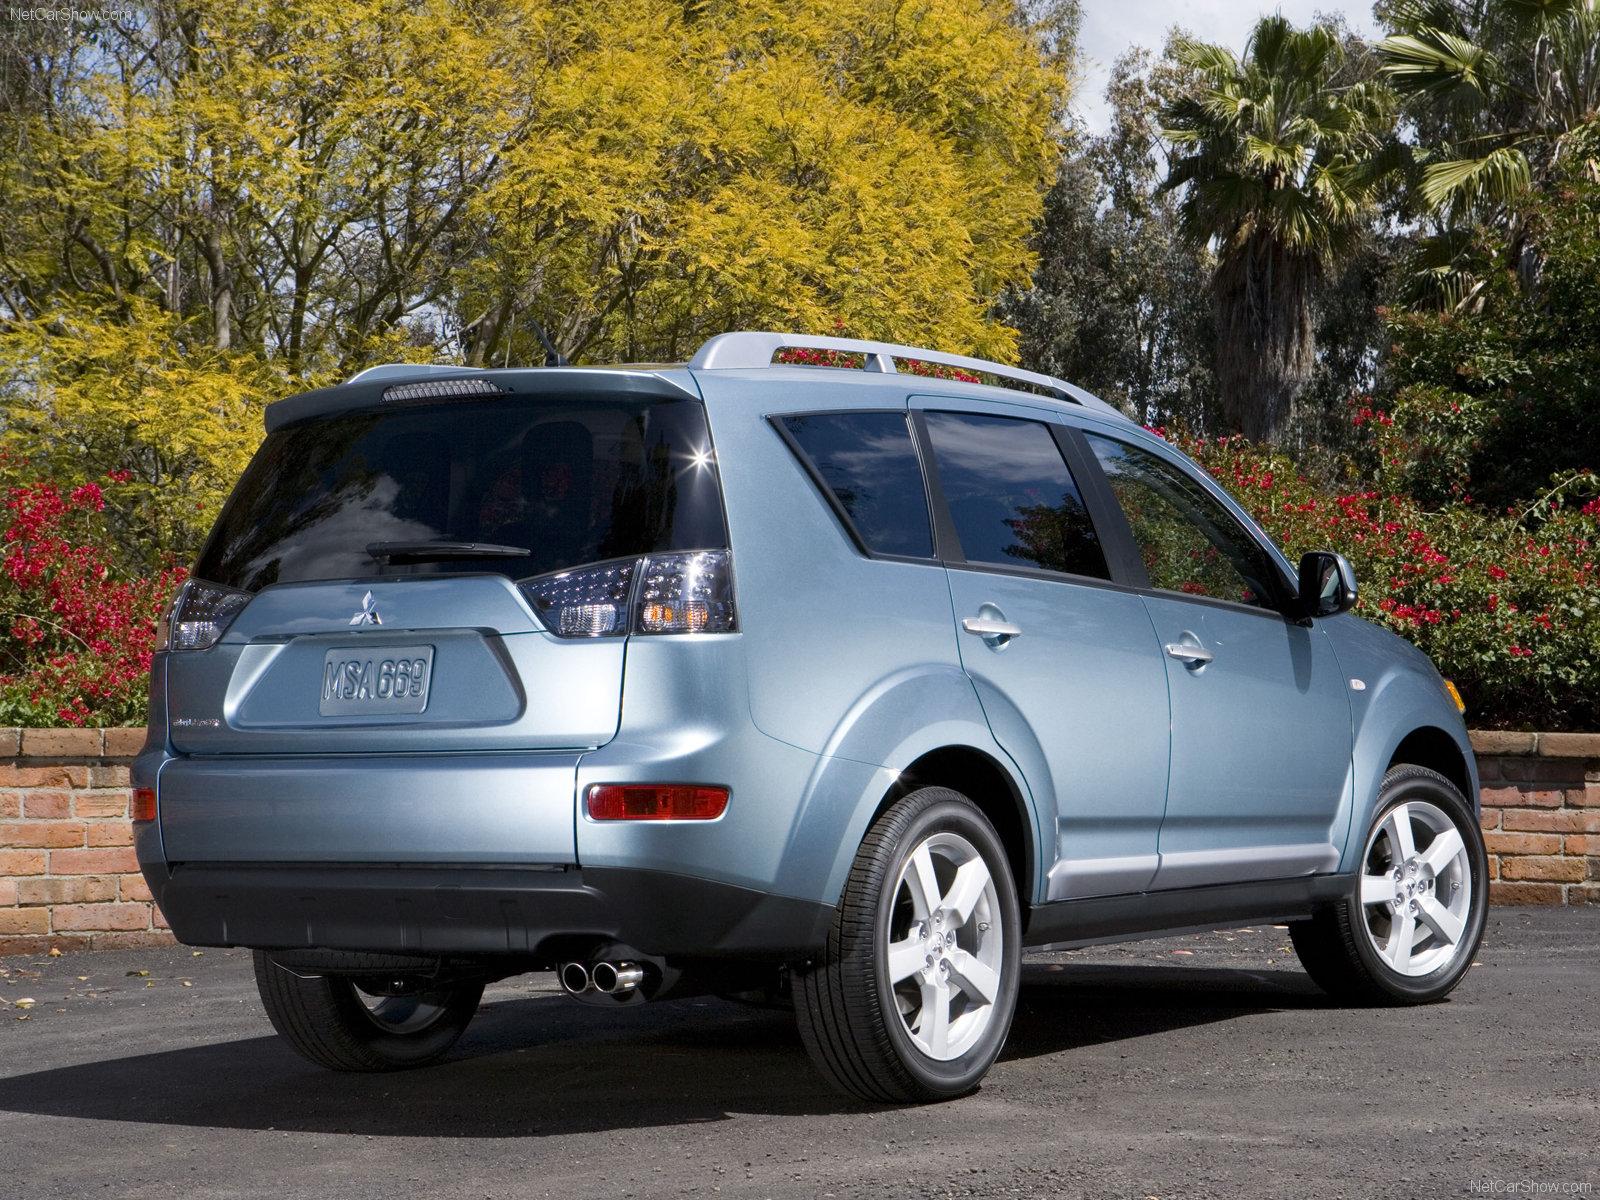 Mitsubishi outlander 2007 problems